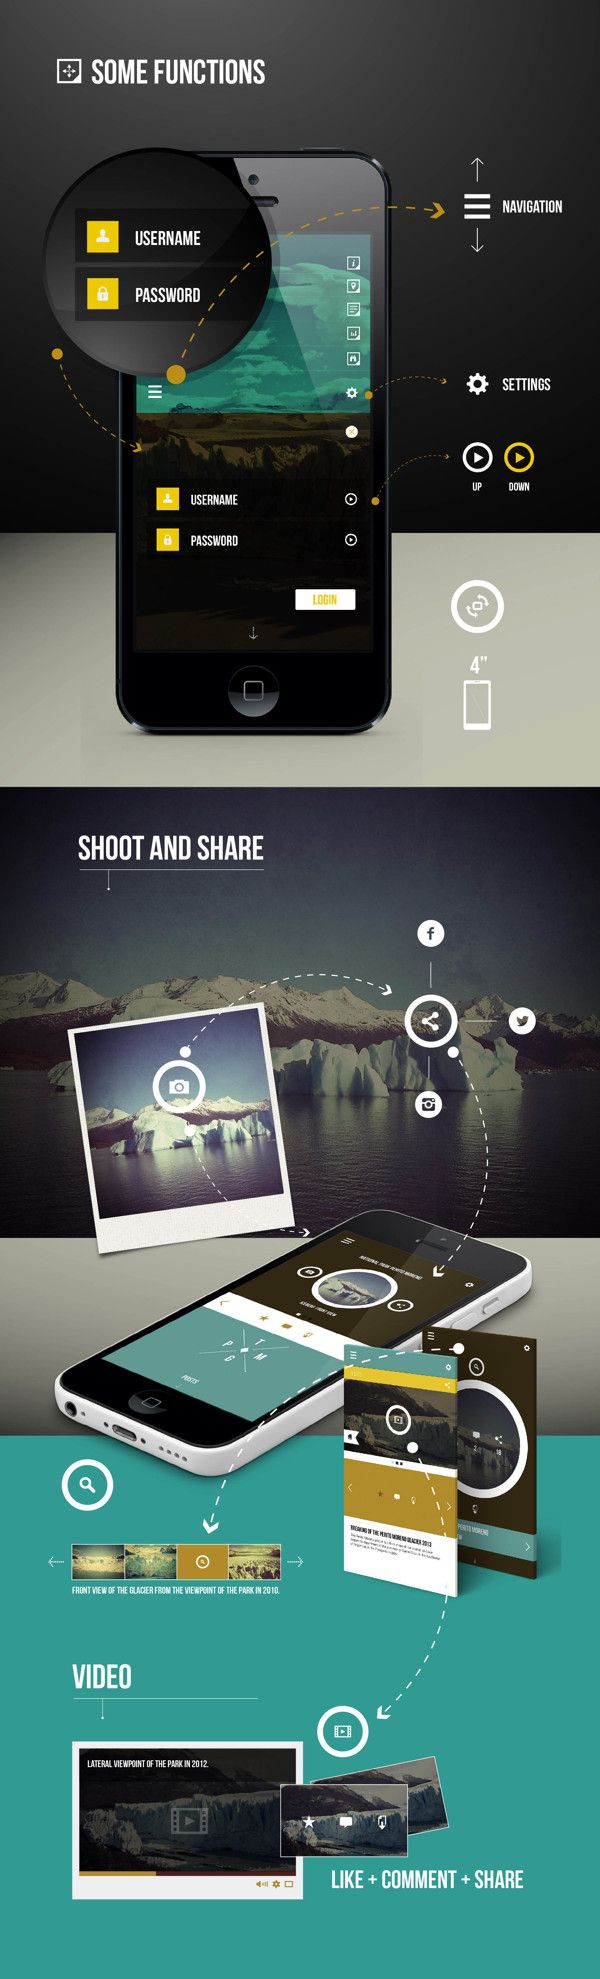 The Glacier - Mobile App Concept by Martín Liveratore, via Behance